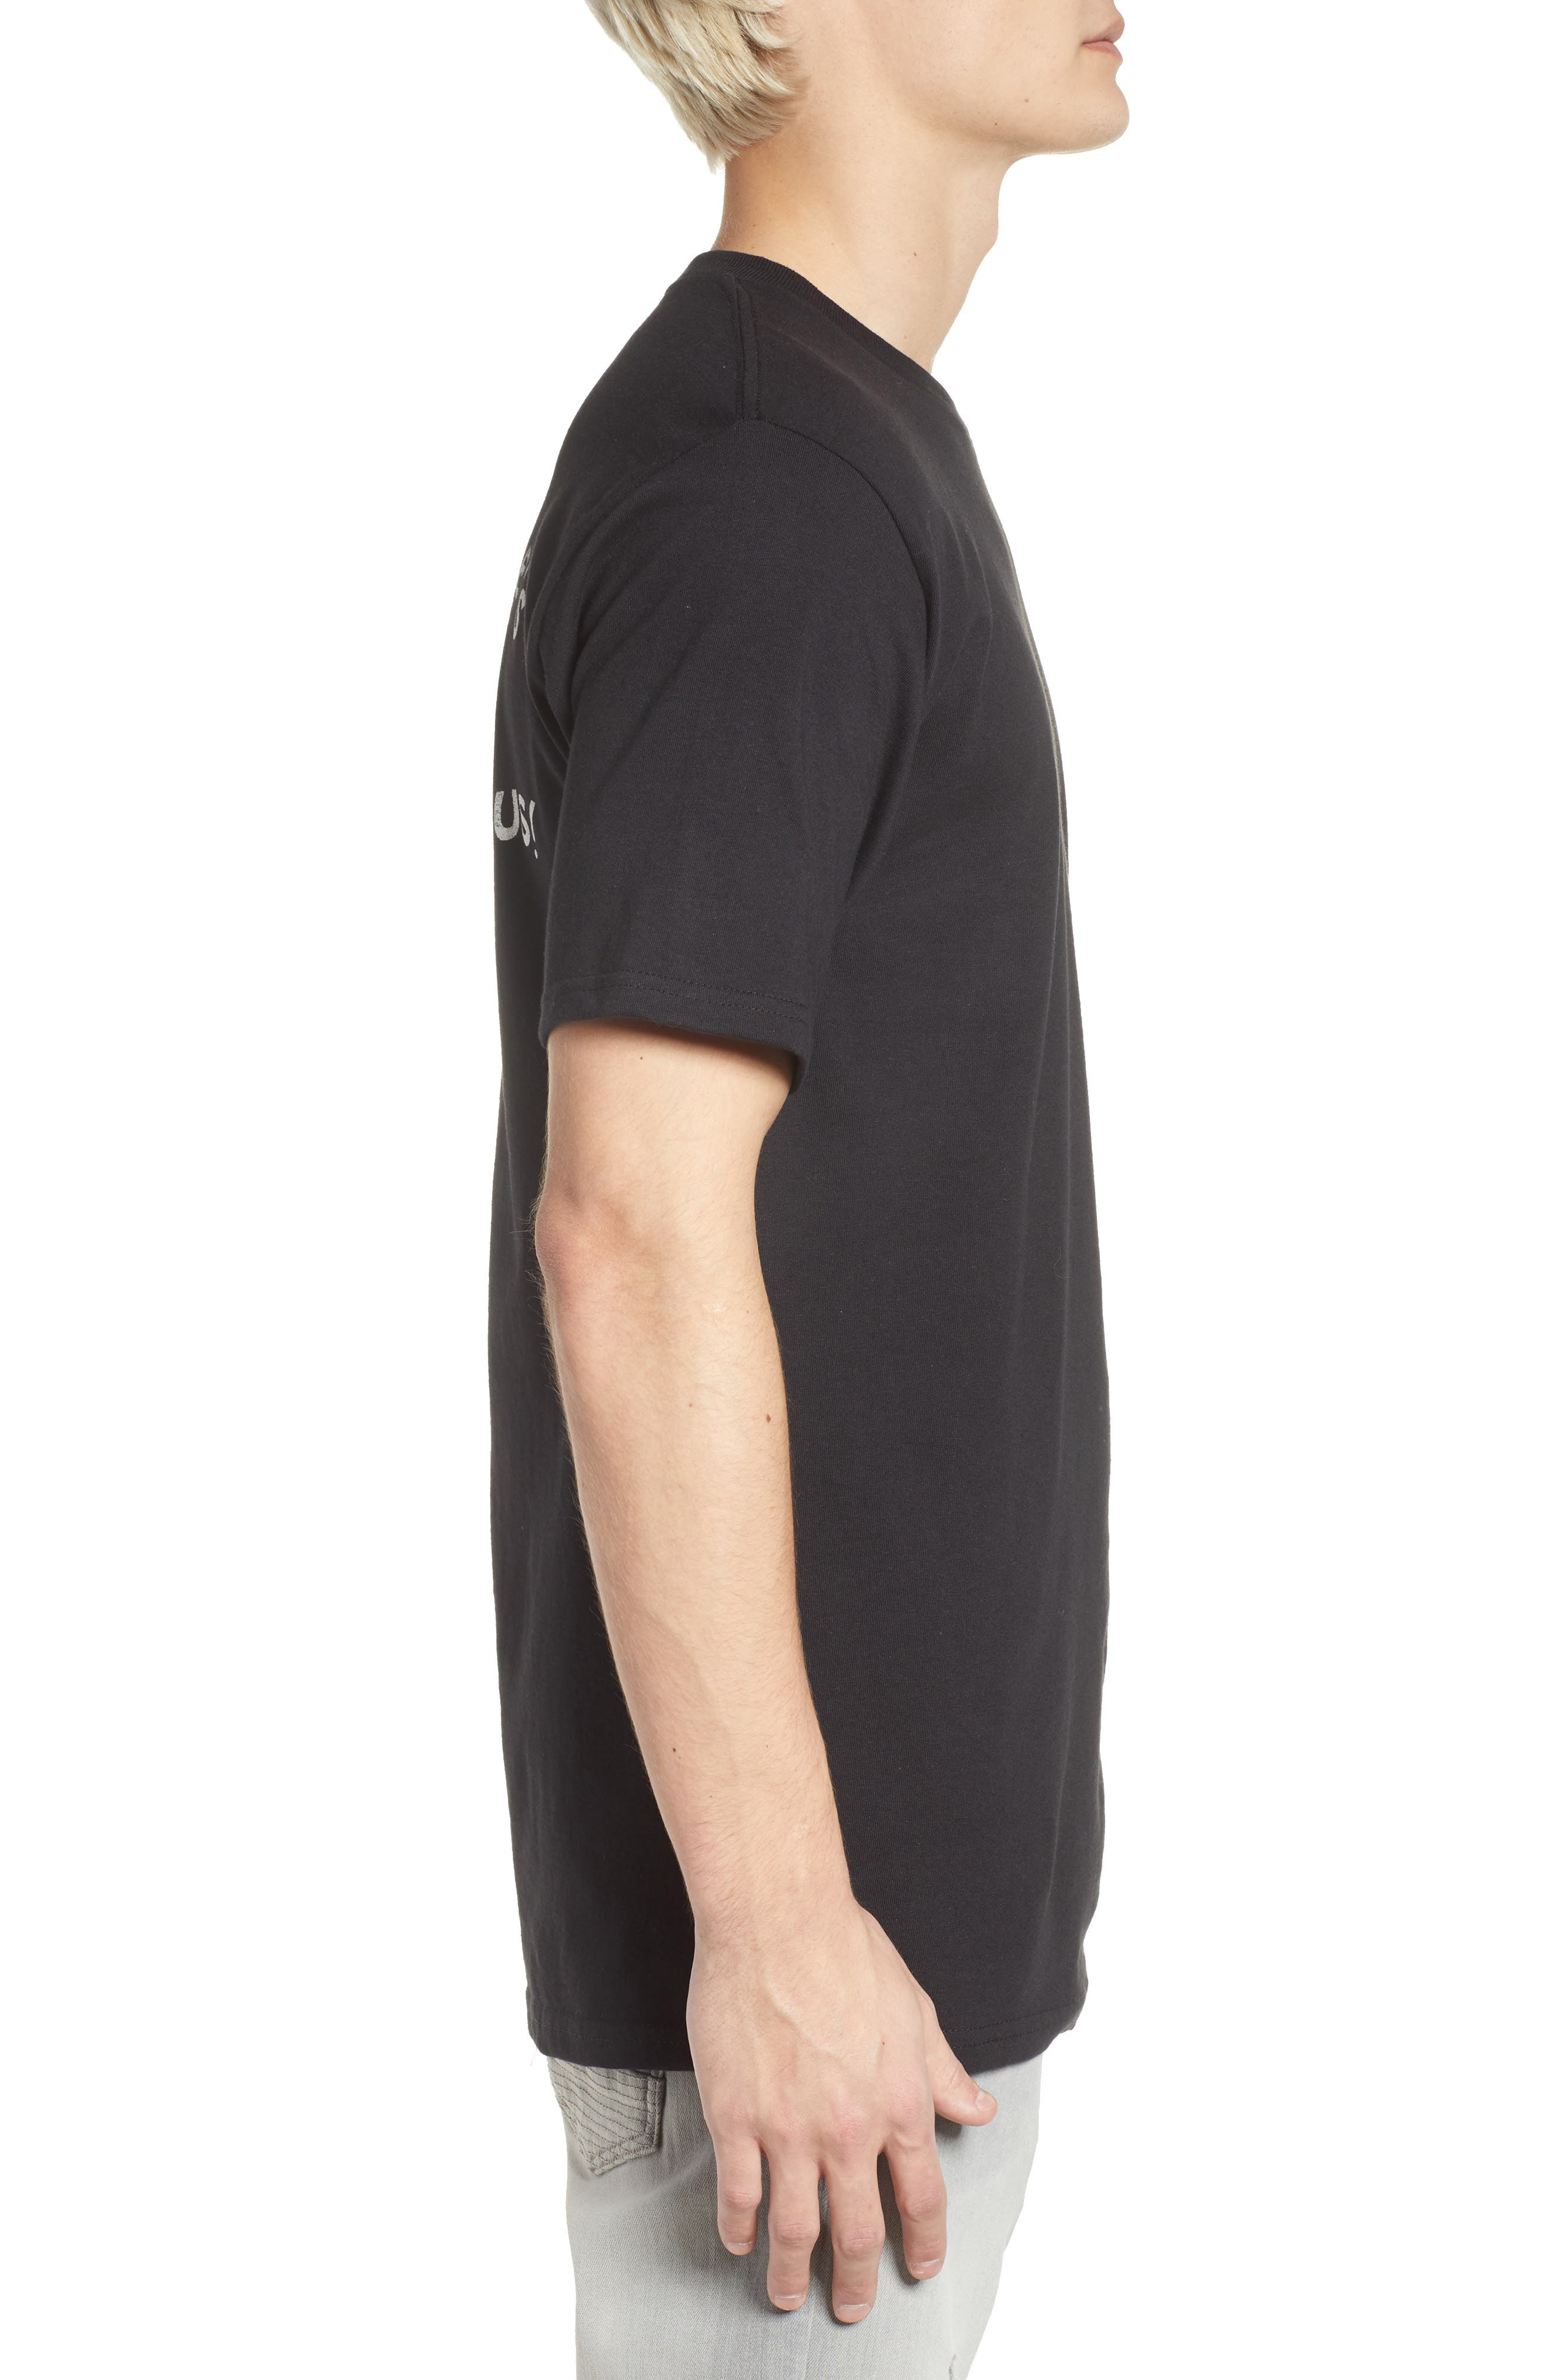 Swingers Saloon T-Shirt,                             Alternate thumbnail 3, color,                             Black